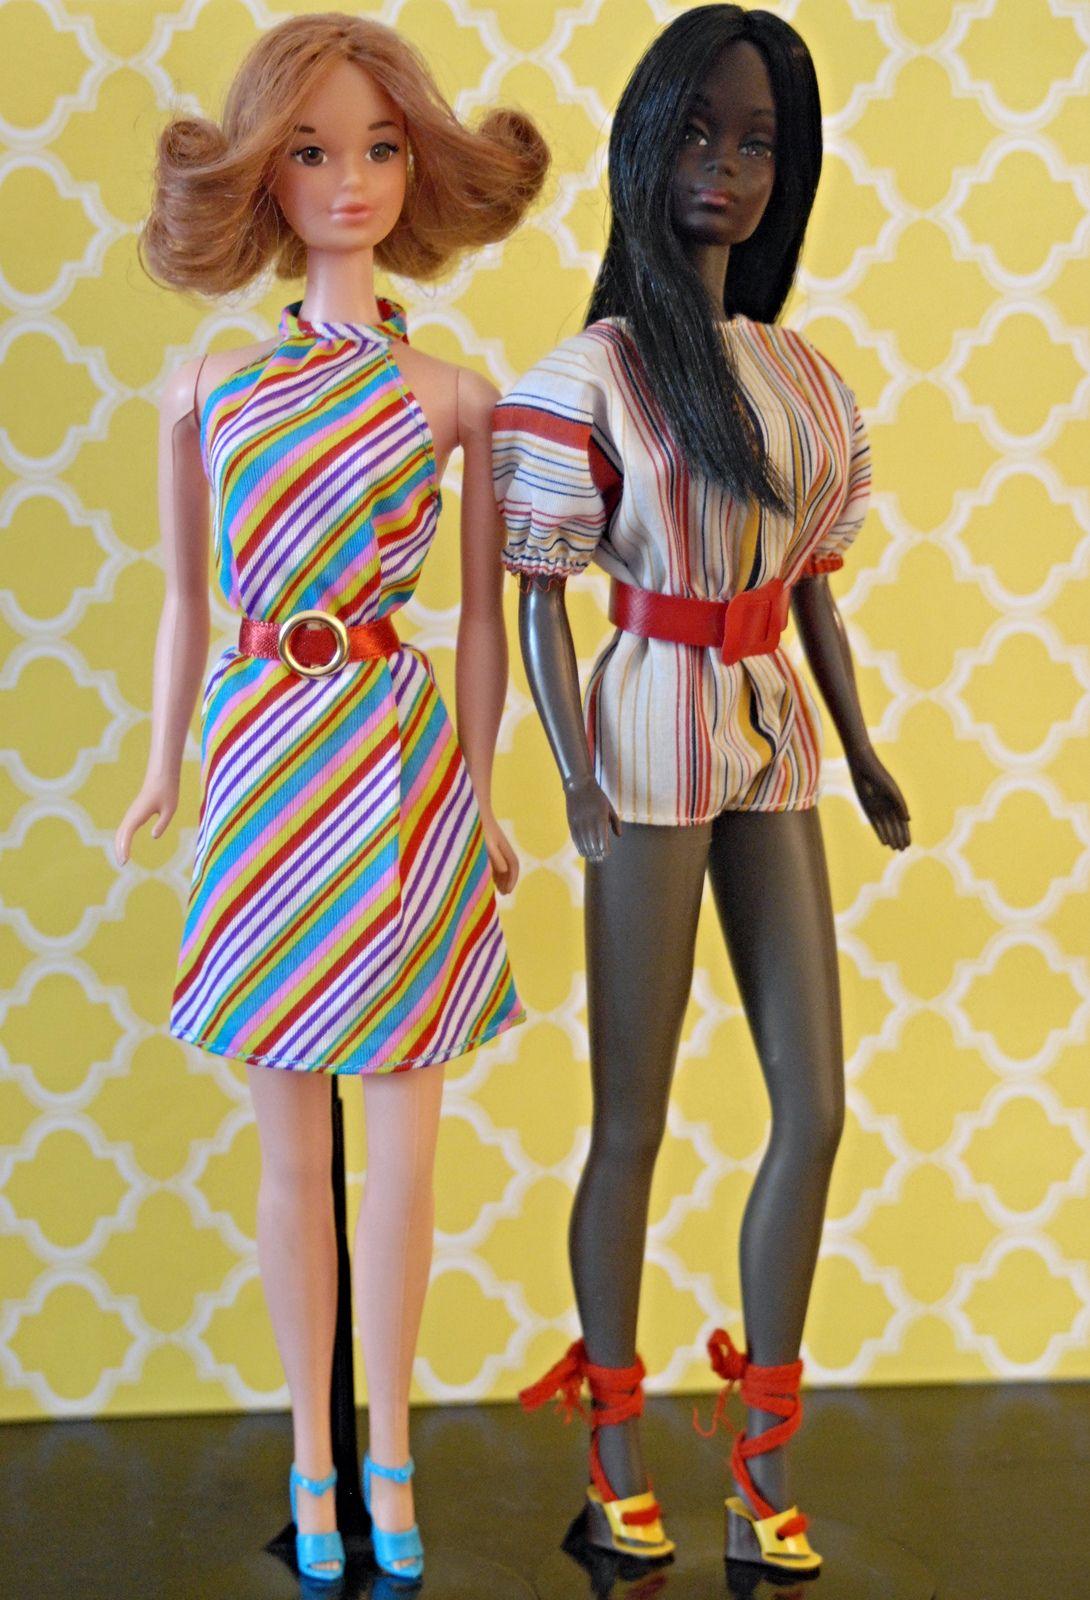 Quick Curl Barbie and Sensational Malibu Christie | by RomitaGirl67